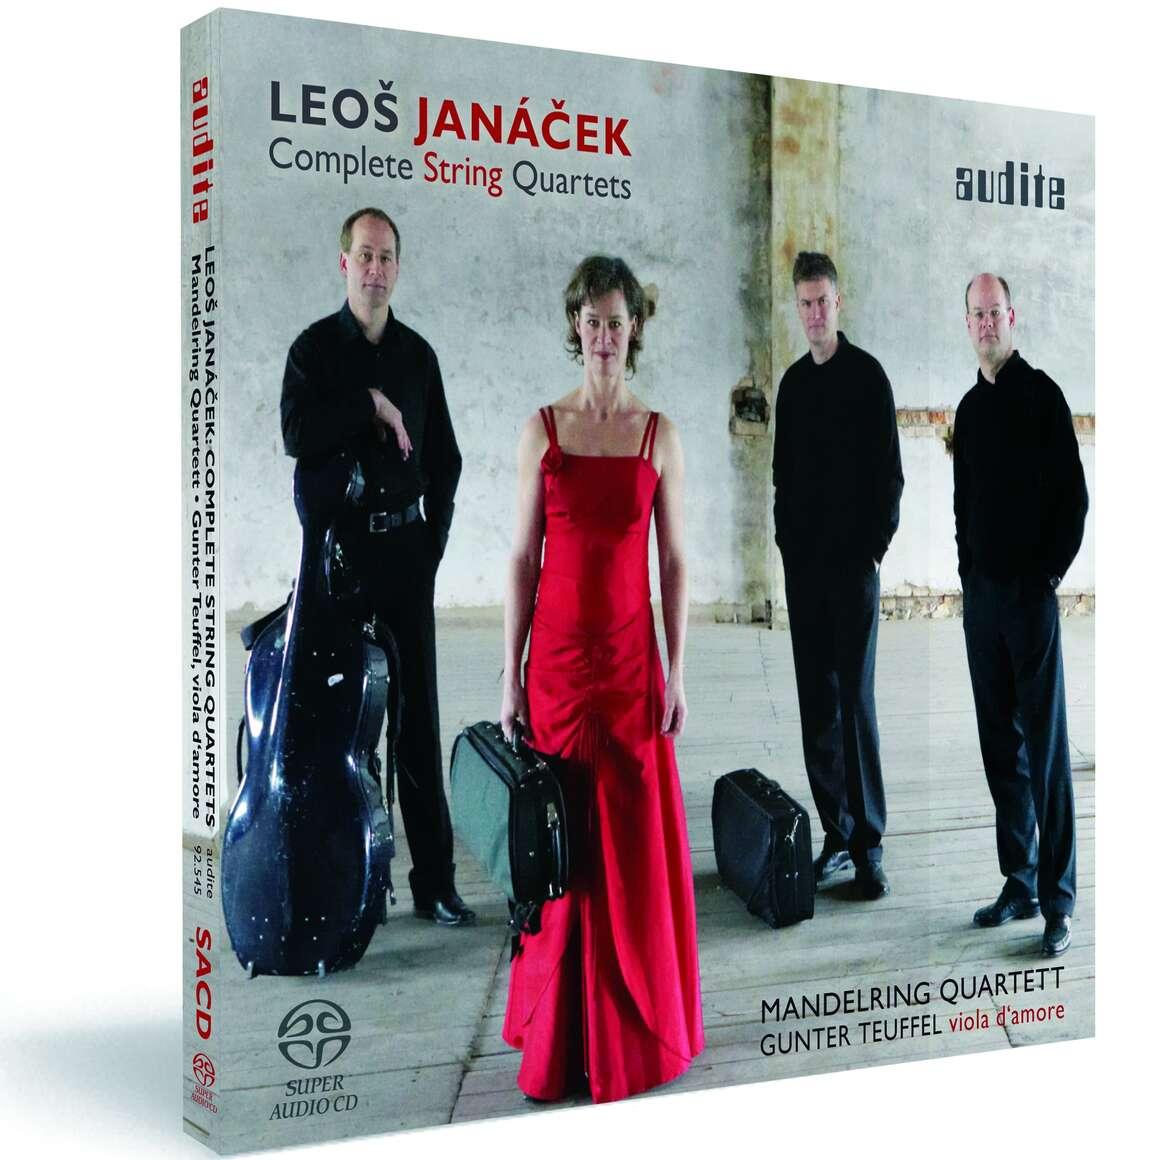 L. Janáček: Complete String Quartets